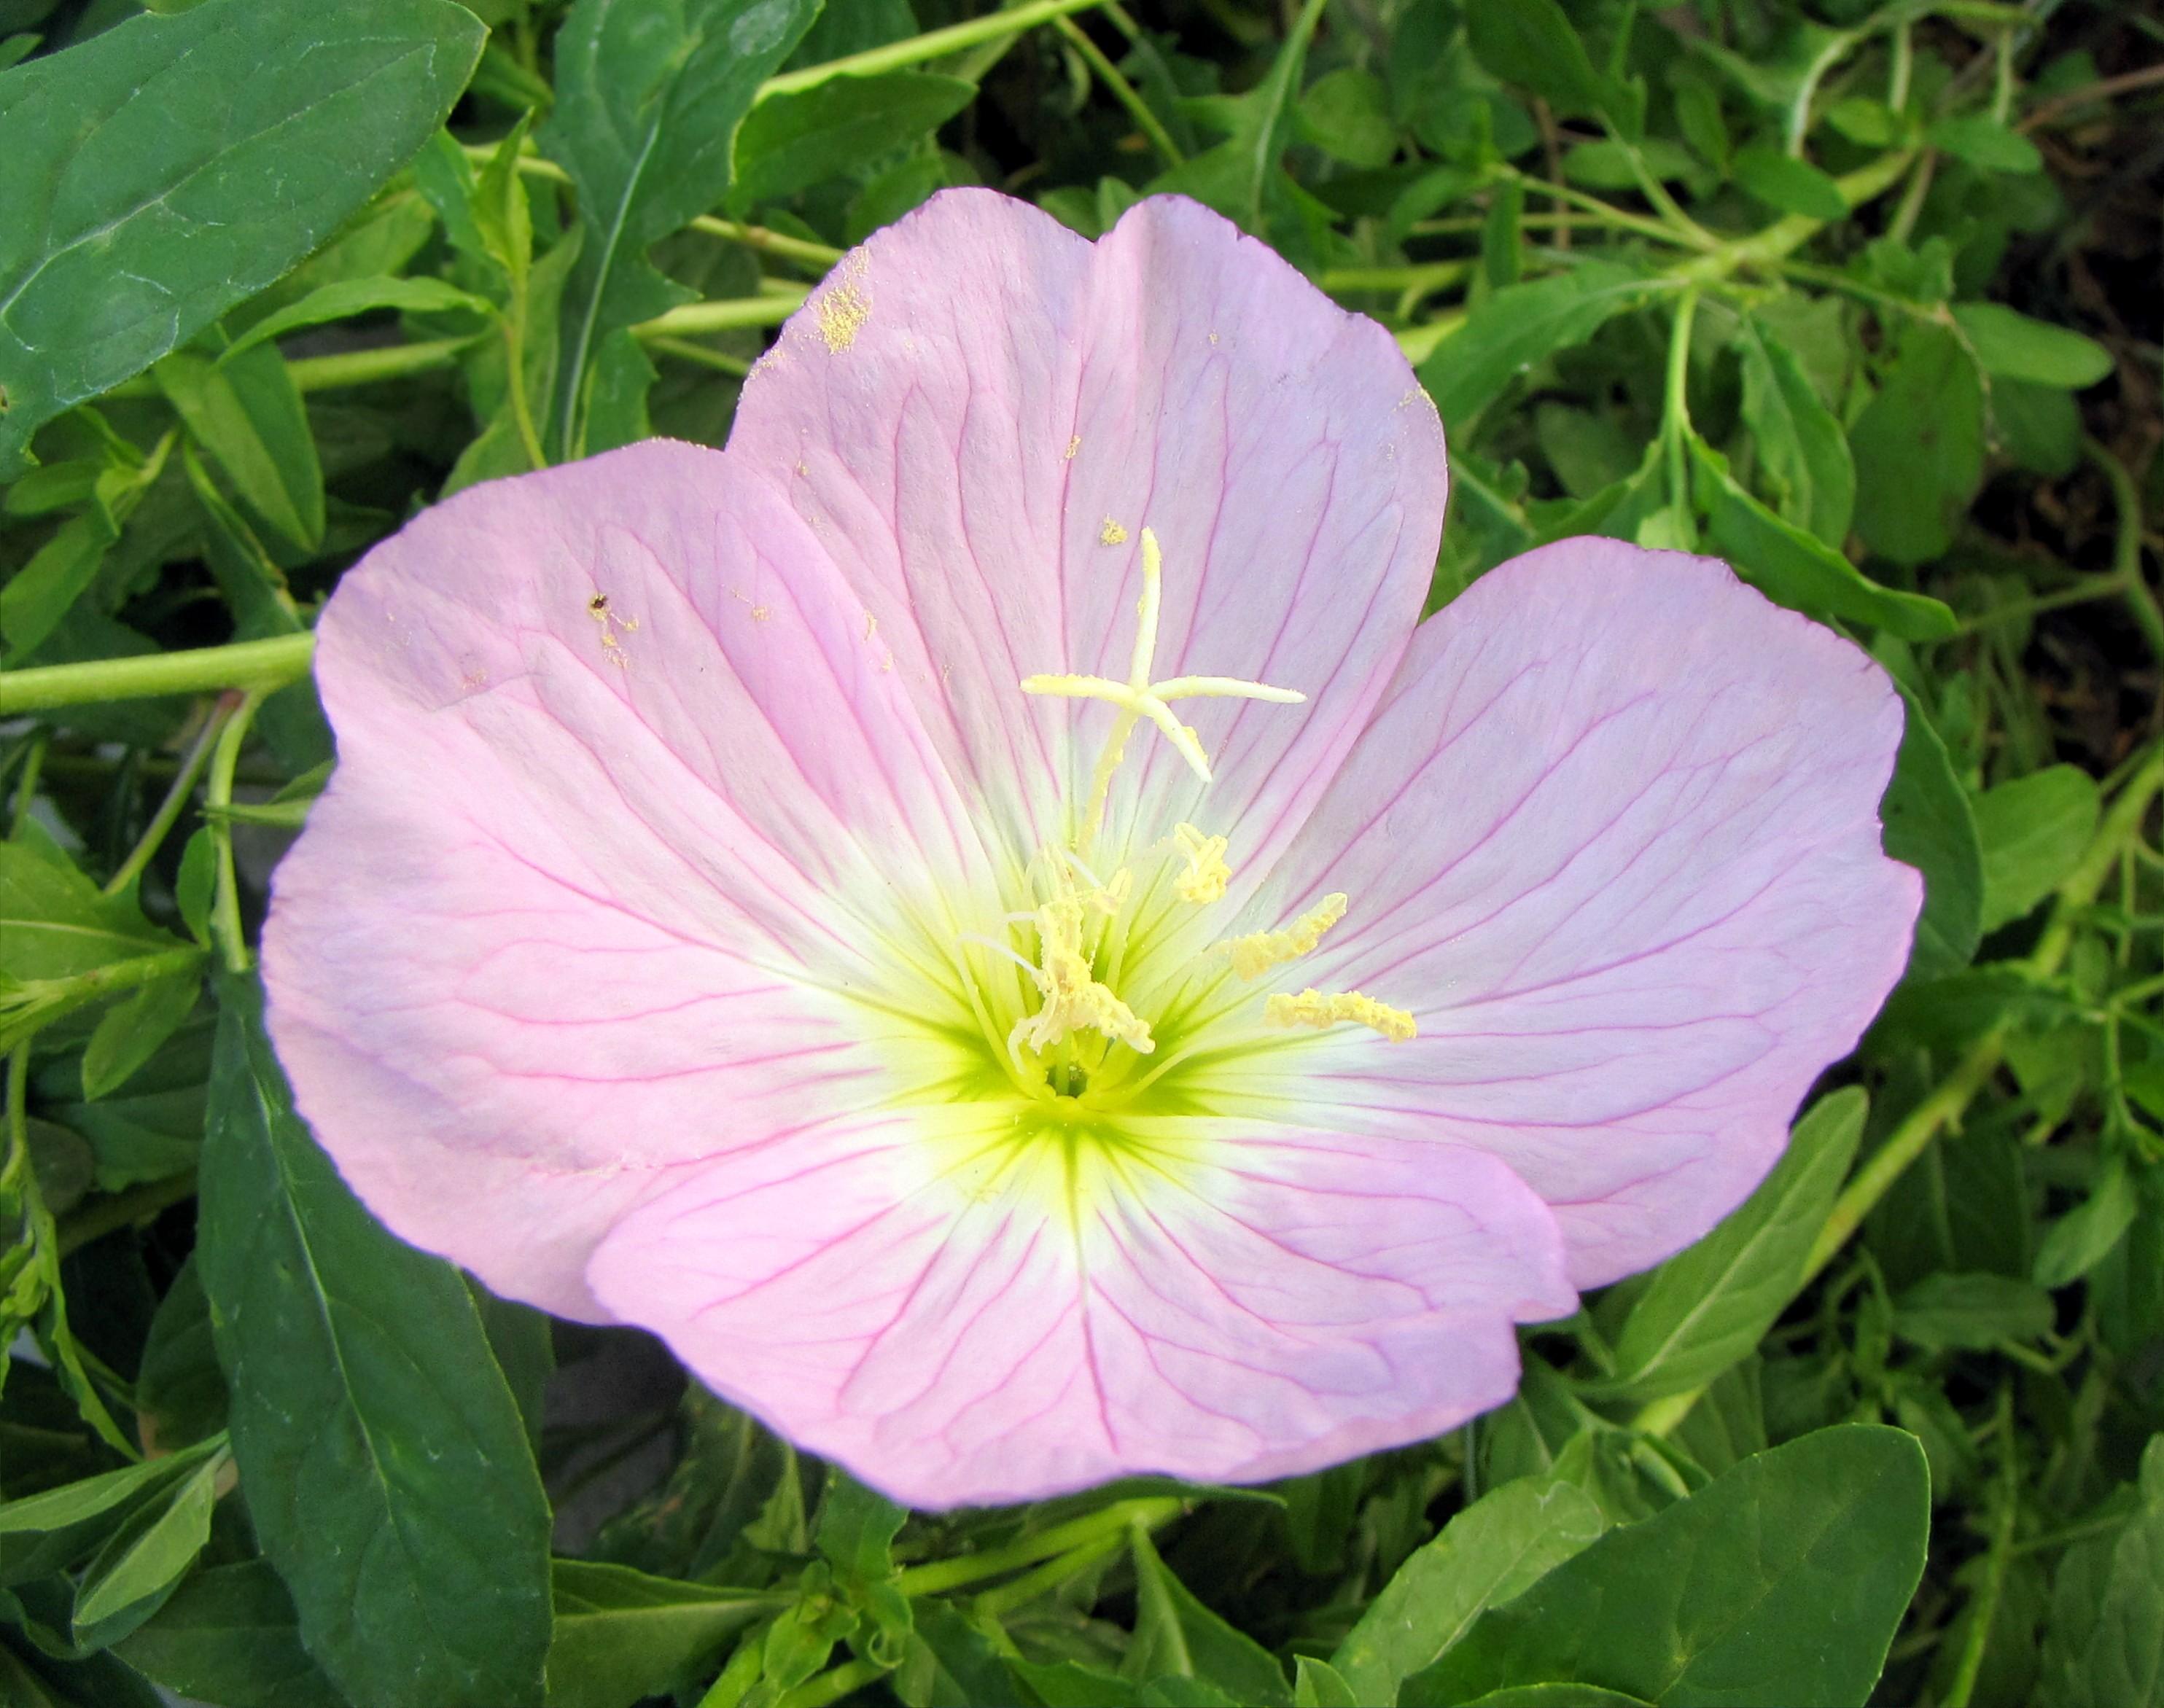 File:Showy Primrose.JPG - Wikimedia Commons